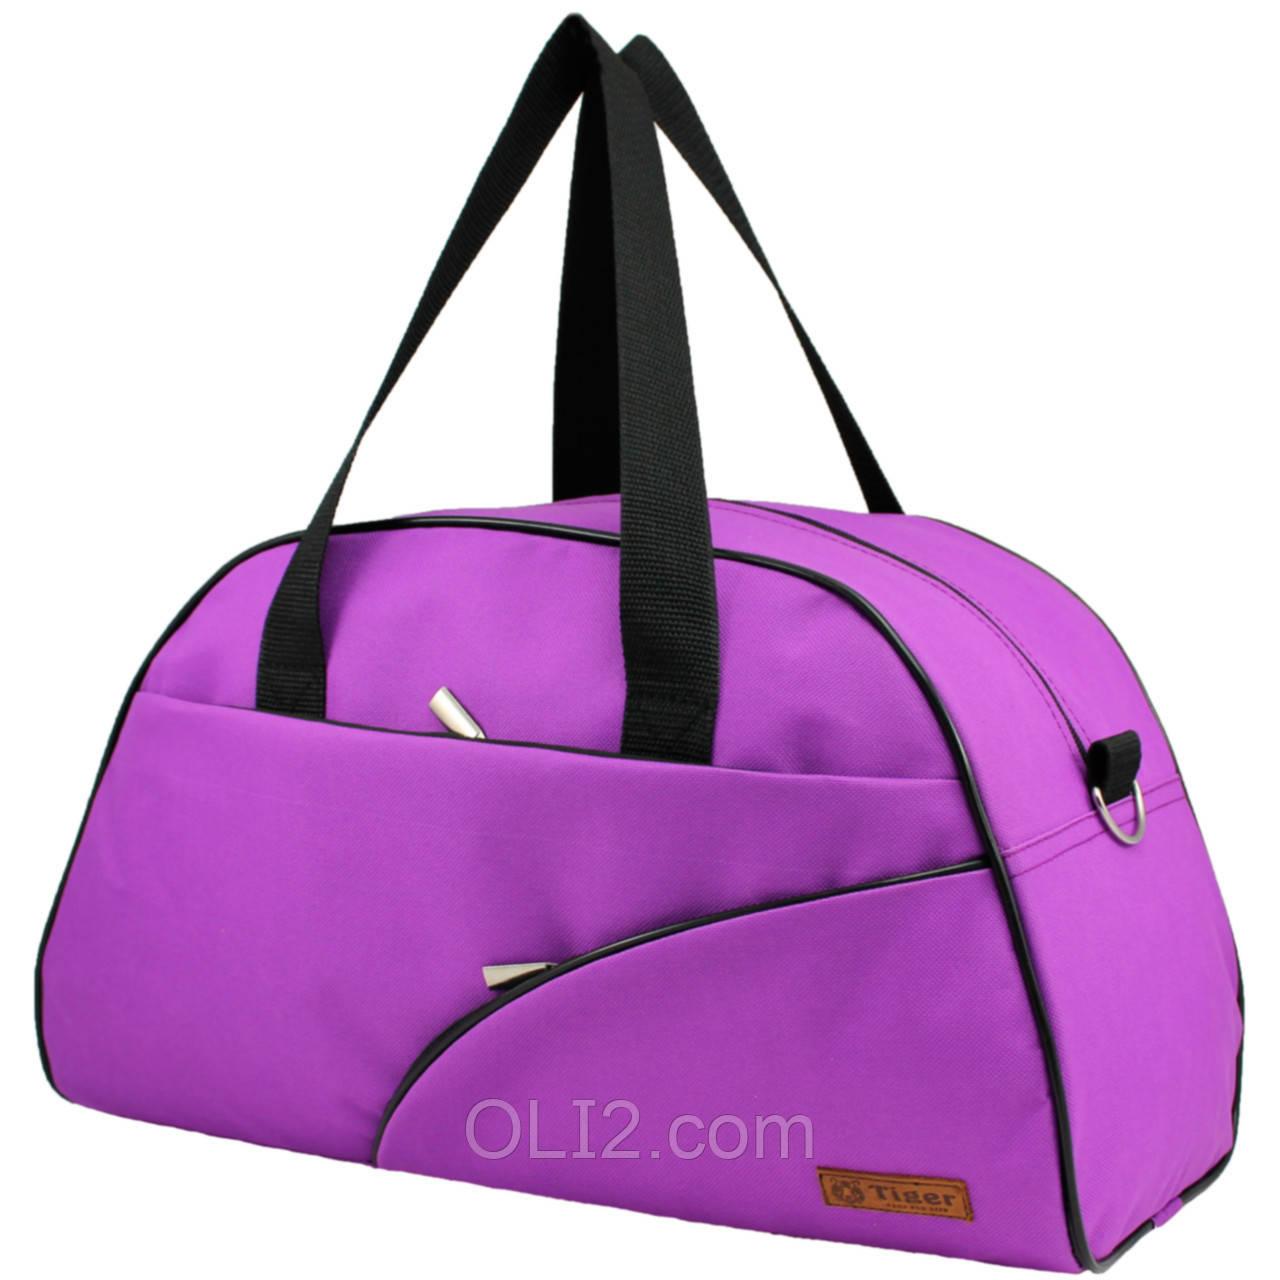 Сумки фитнес Tiger спортивная сумка